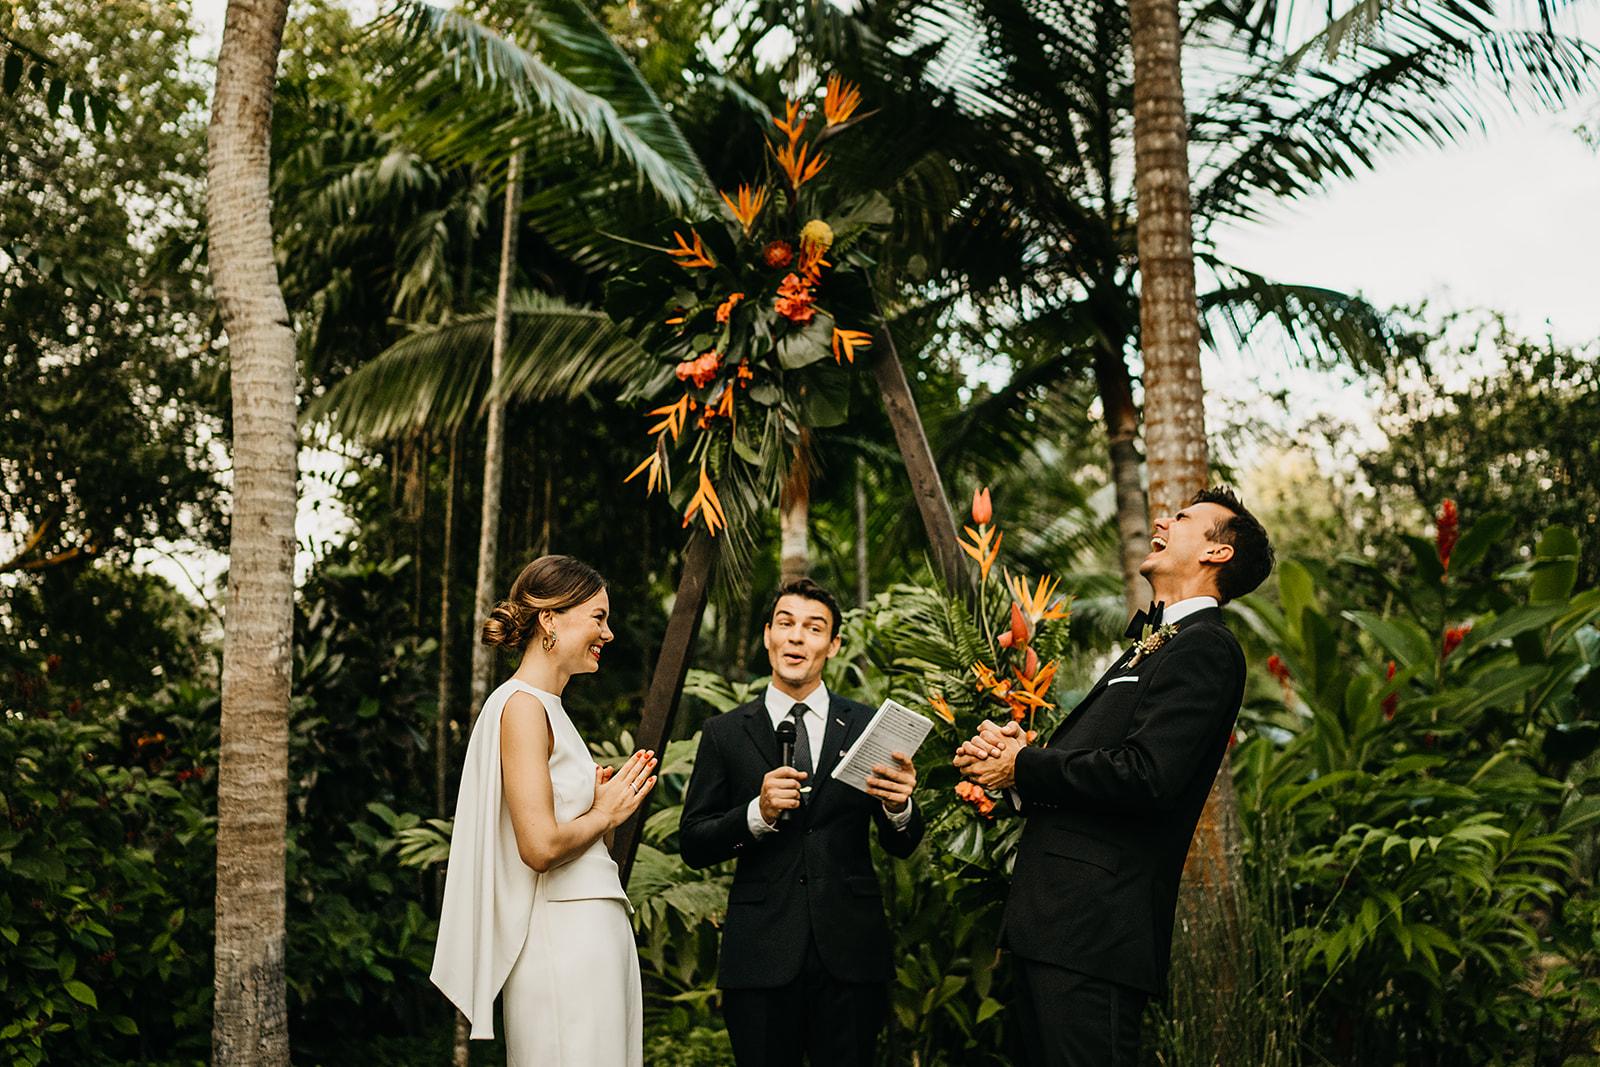 AmandaMarkus-Hacienda-Sac-Chich-Merida-Wedding-507_websize.jpg